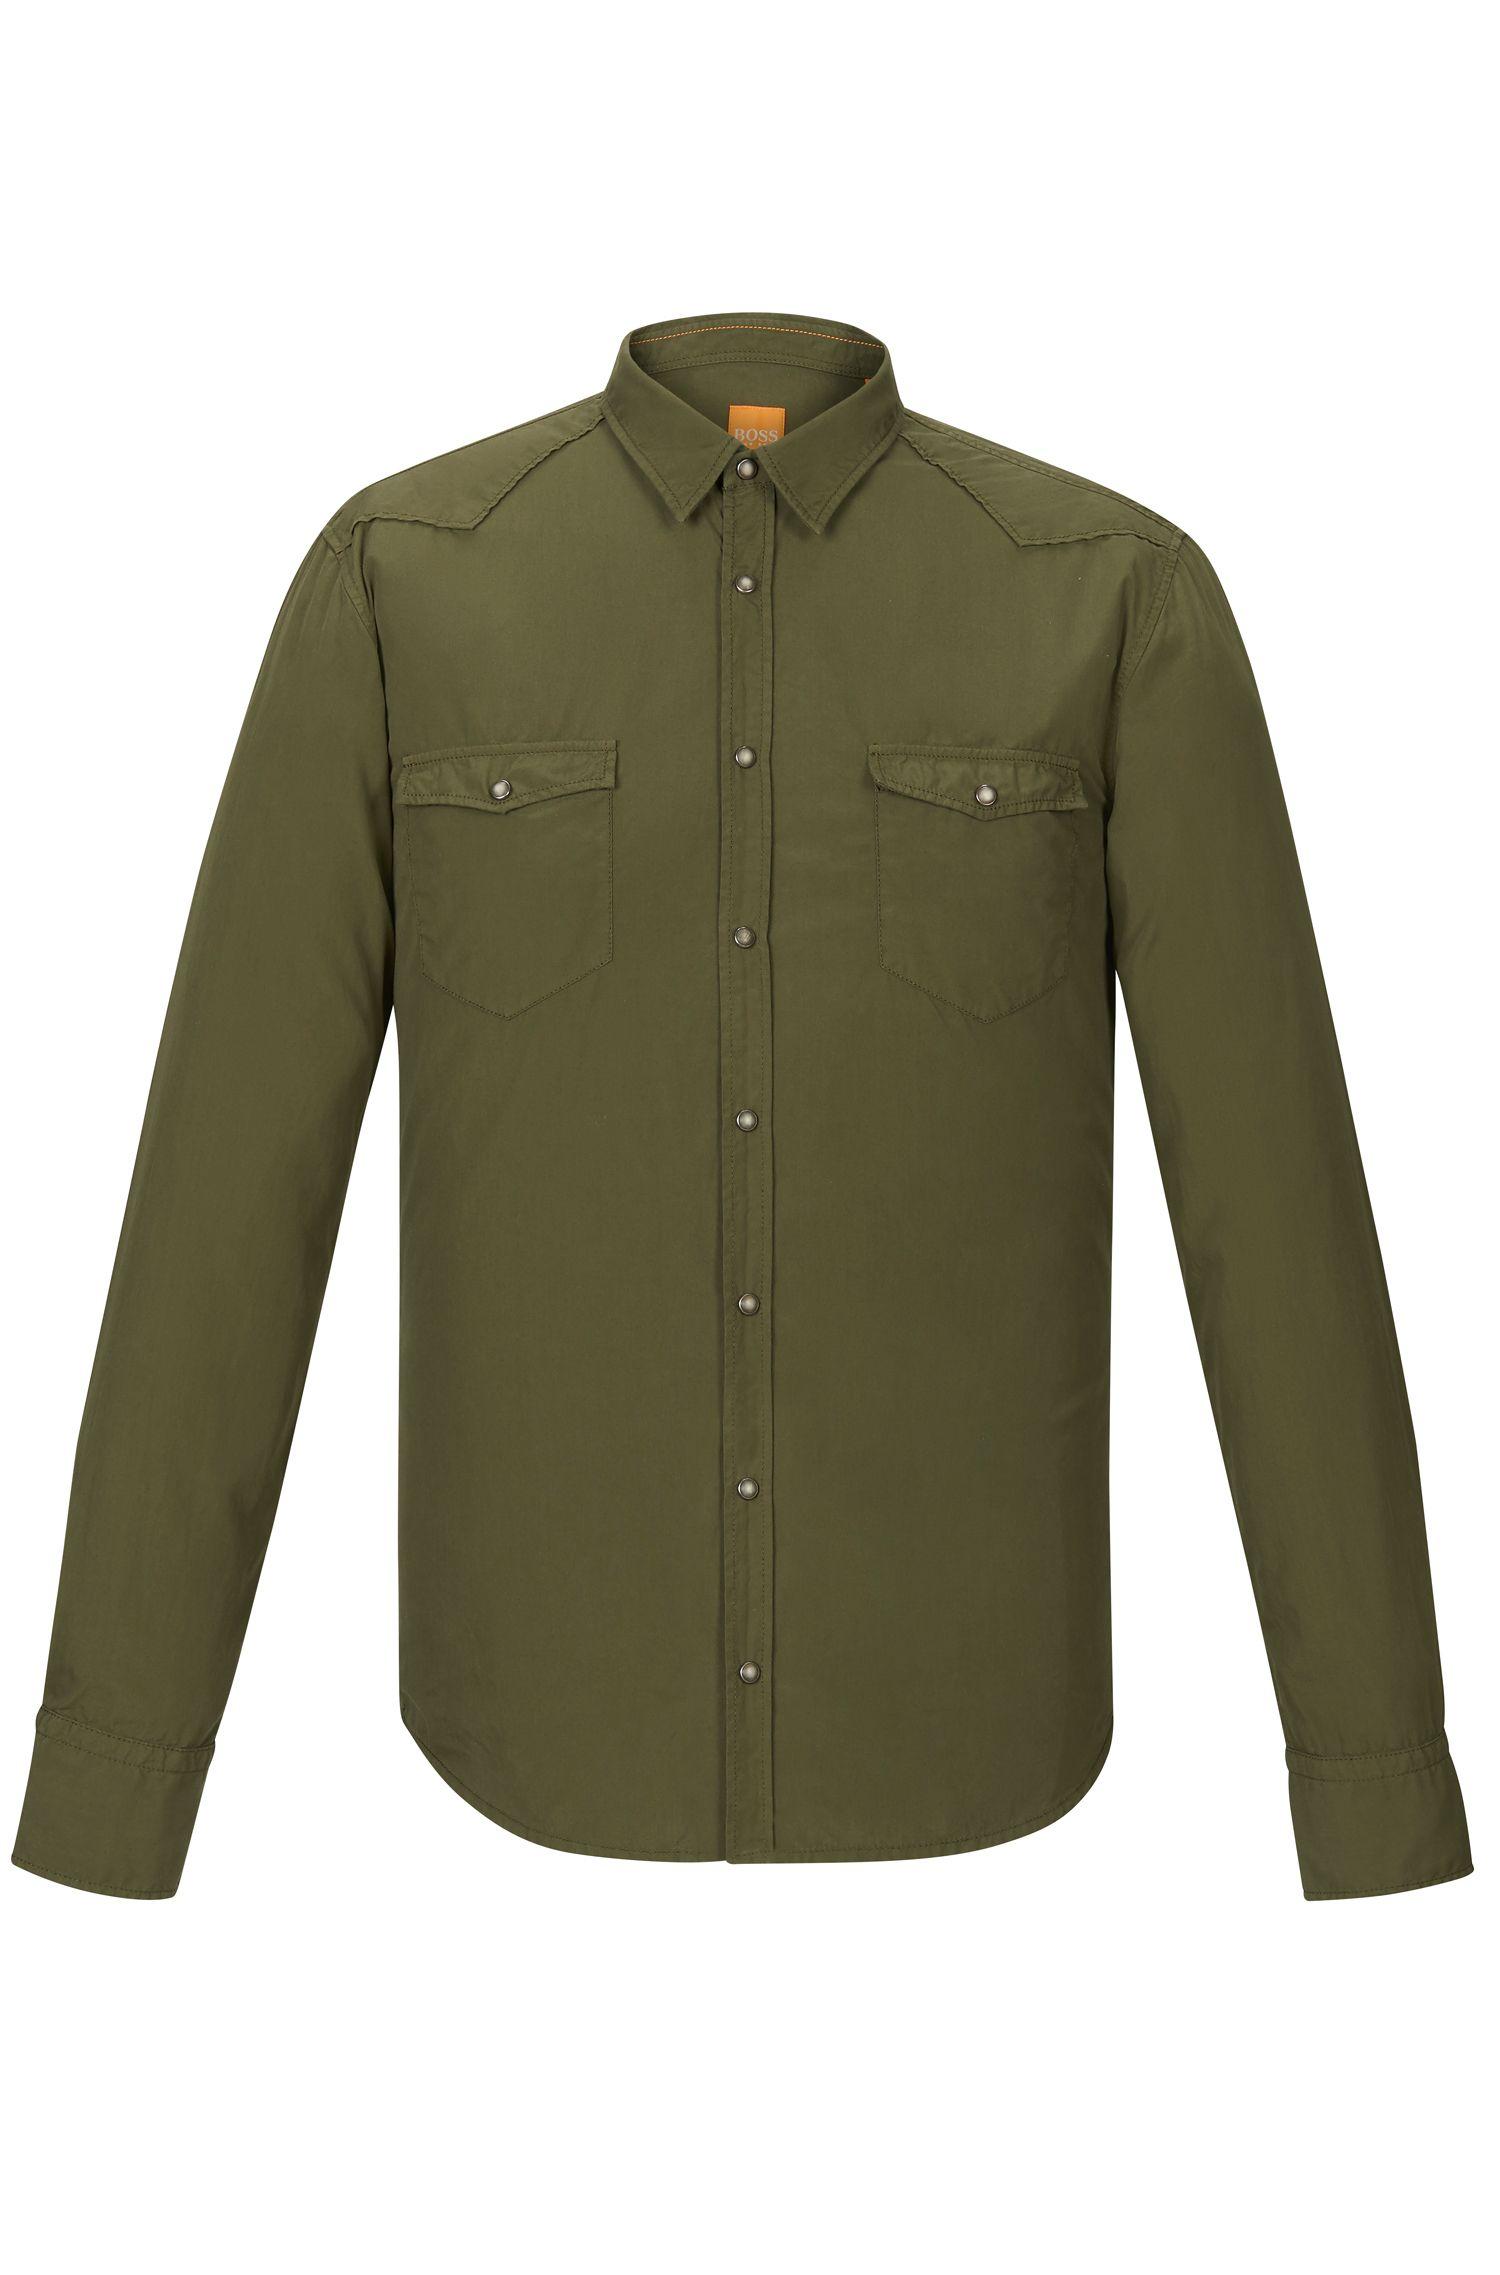 Cotton Poplin Button Down Shirt, Slim Fit | Erodeo